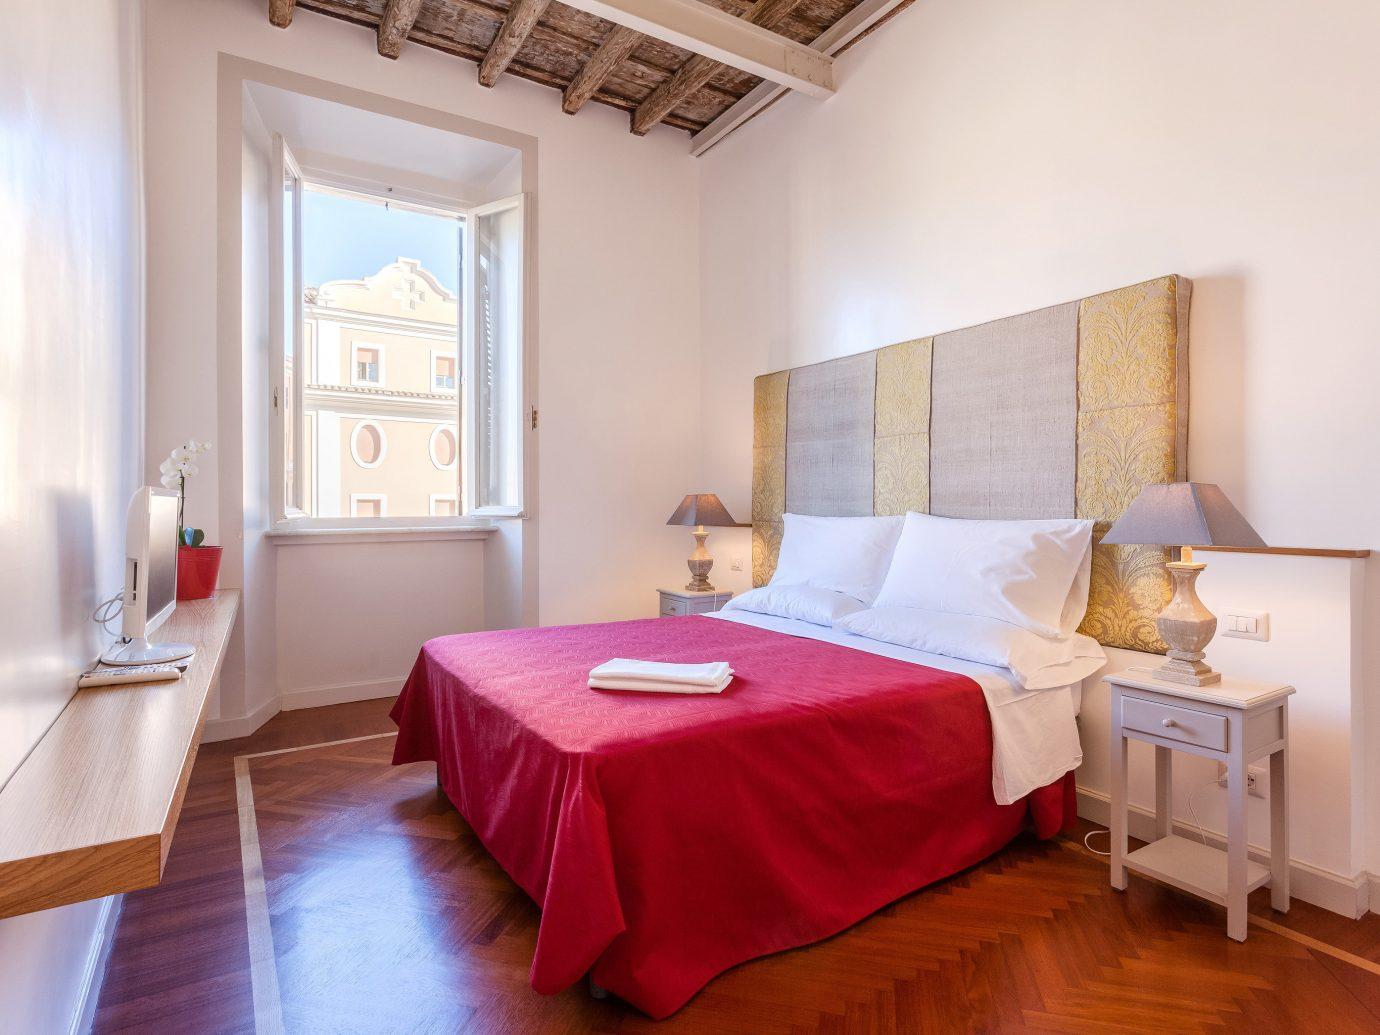 Bedroom charming cozy homey Hotels quaint view floor indoor wall room bed interior design Villa